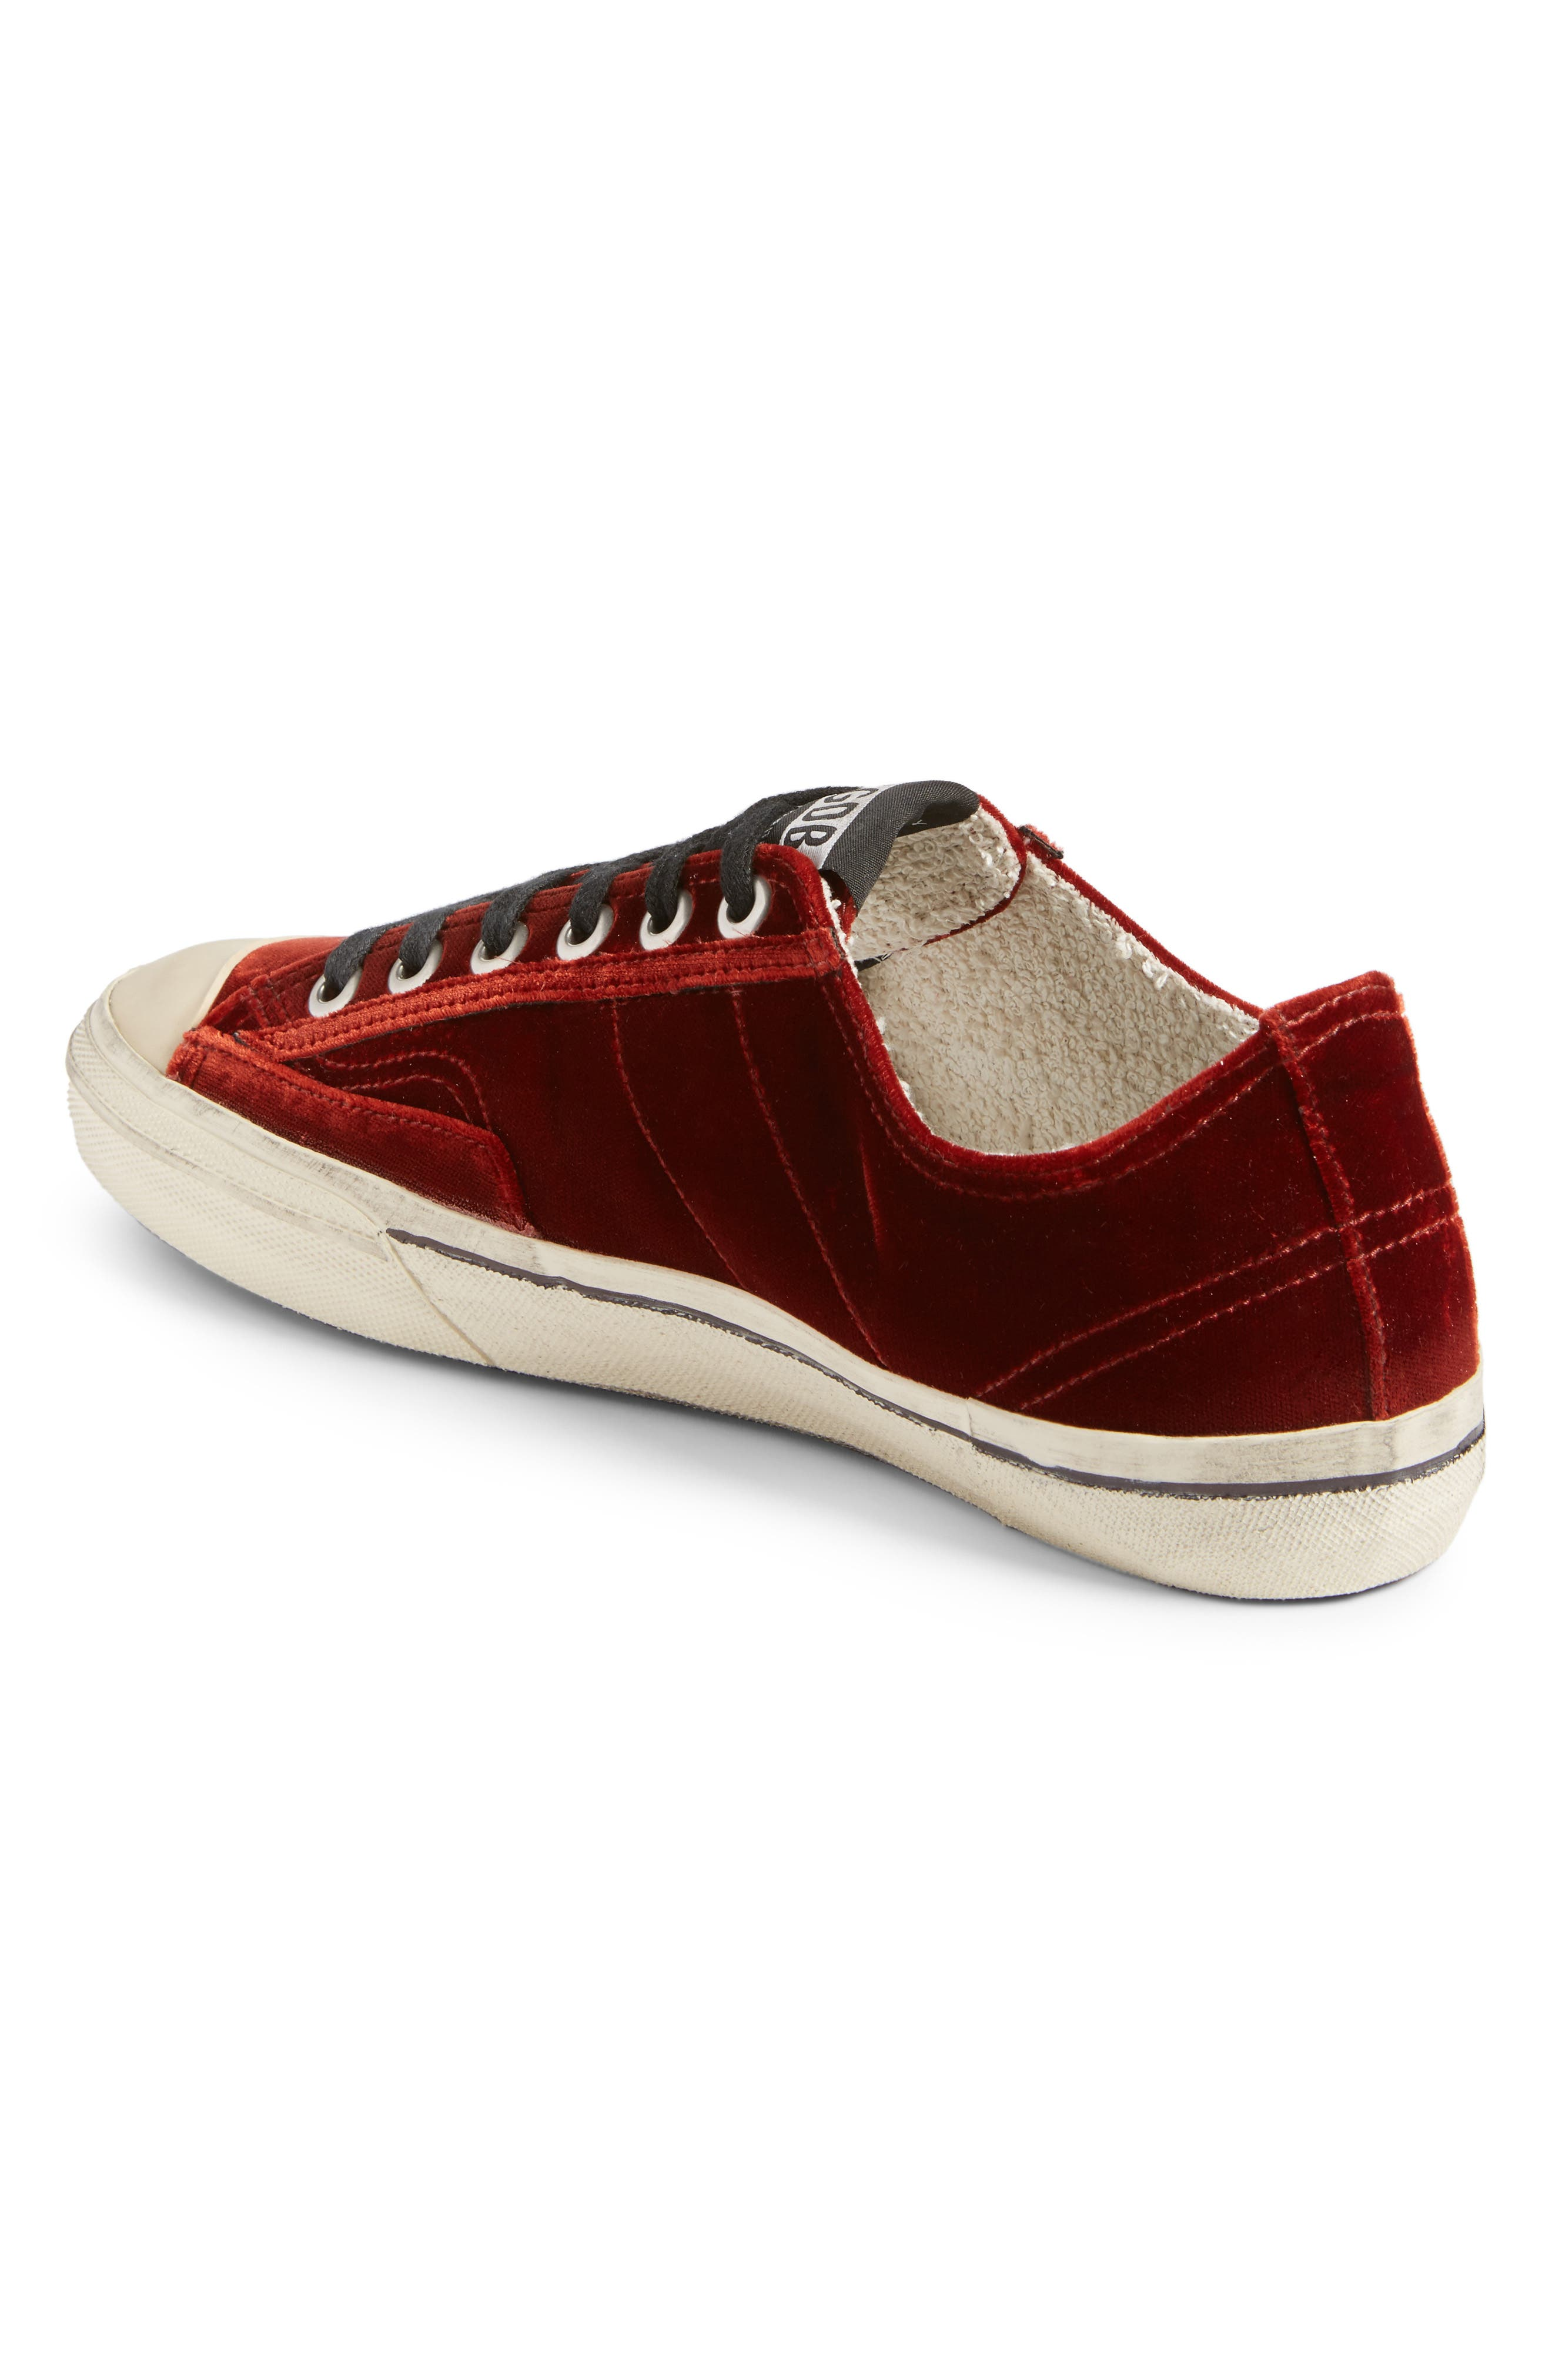 V-Star 2 Low Top Sneaker,                             Alternate thumbnail 2, color,                             930